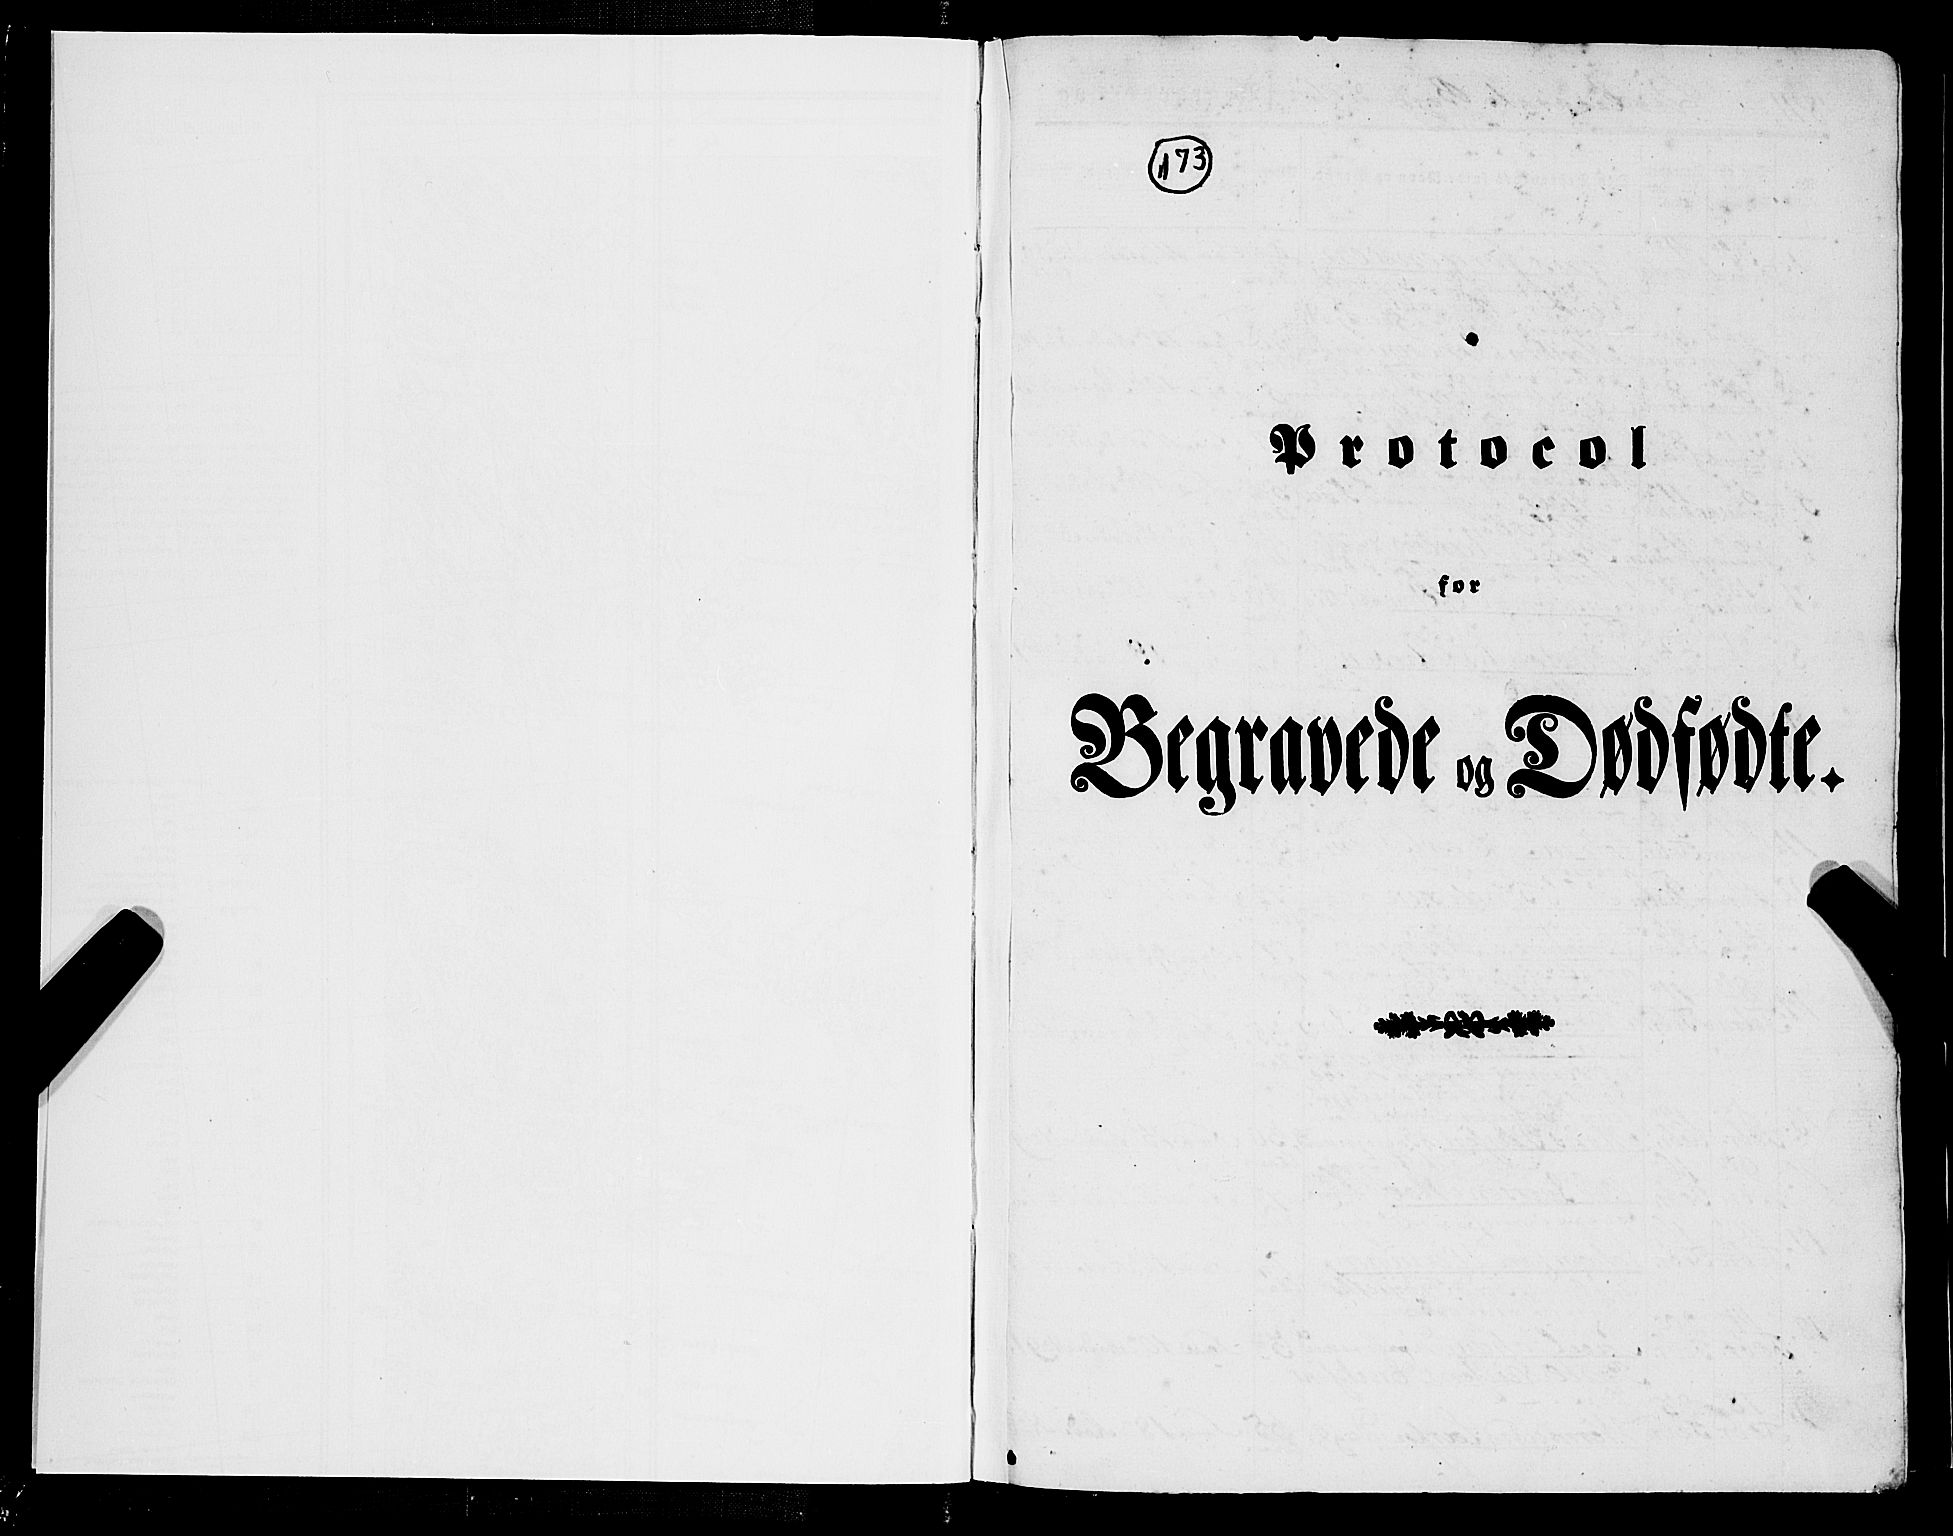 SAB, Domkirken Sokneprestembete, H/Haa/L0040: Ministerialbok nr. E 1, 1841-1853